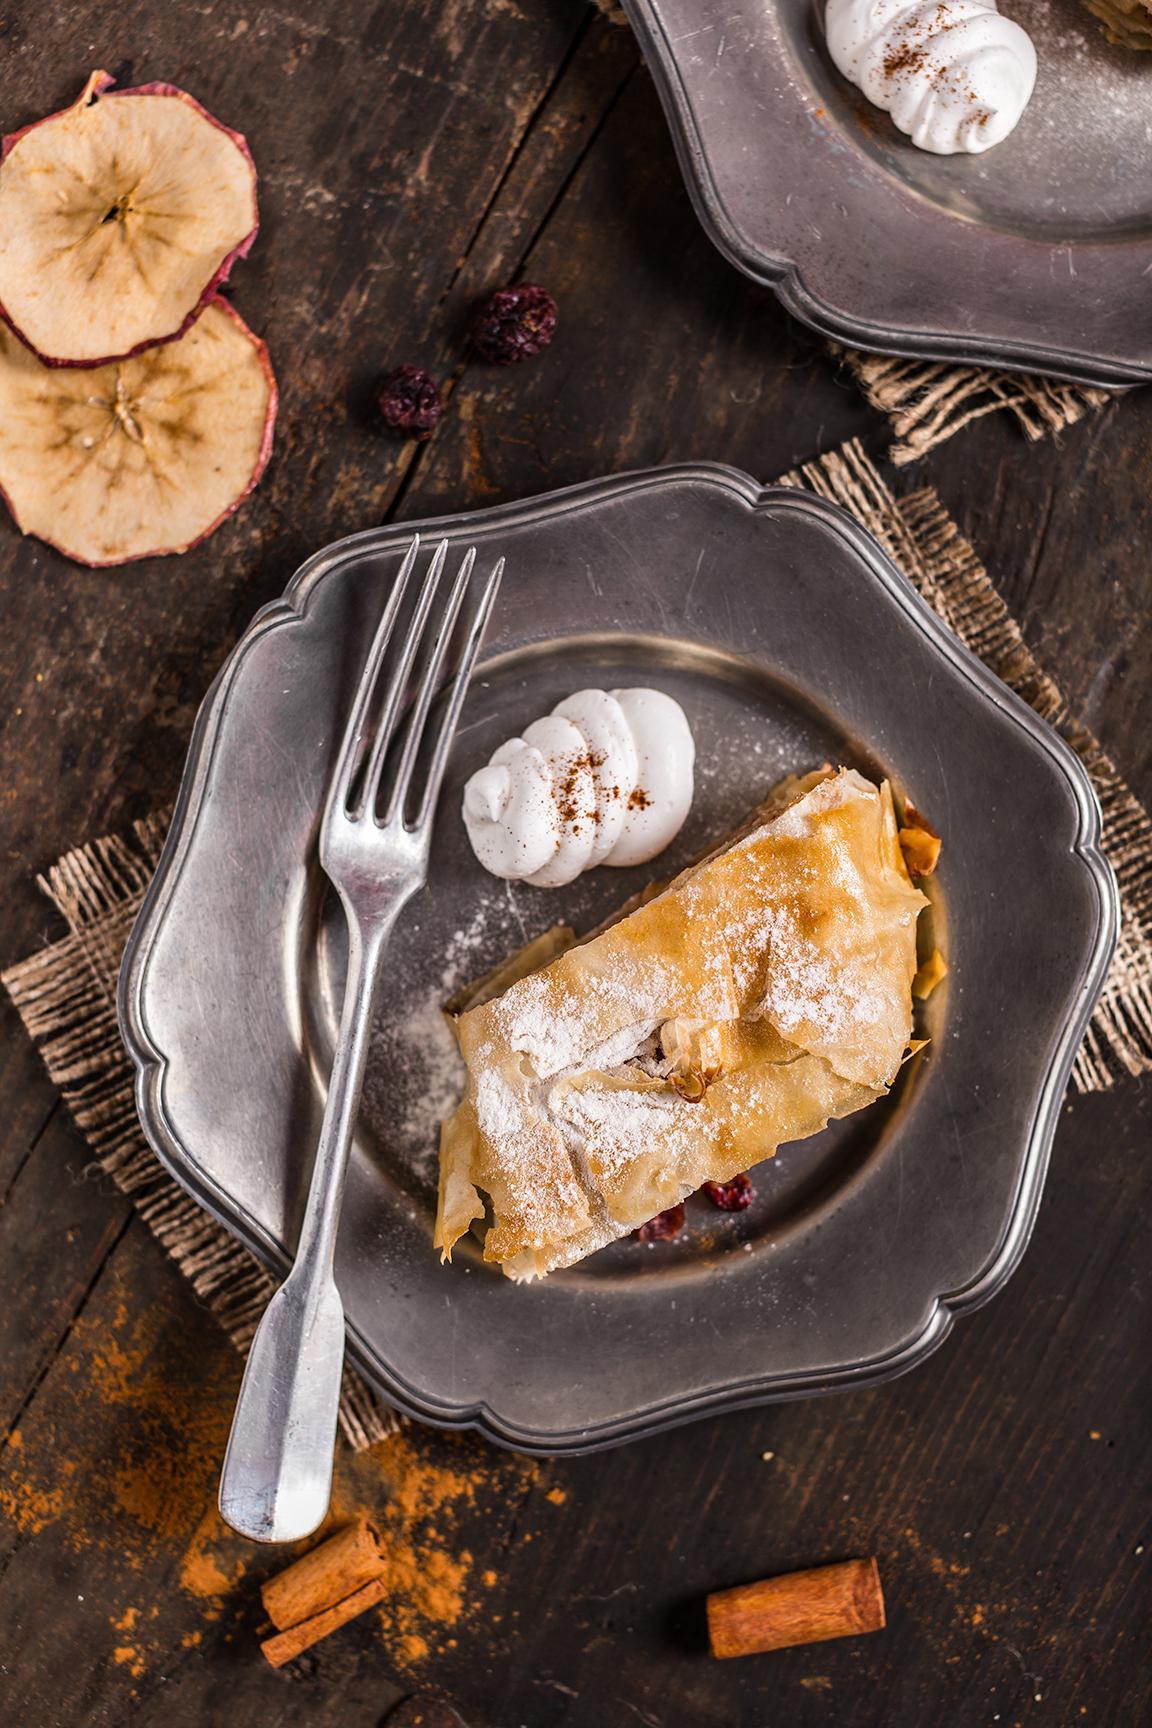 Helathy Vegan apple strudel recipe Ricetta Strudel di mele vegan senza uova senza burro ricetta light